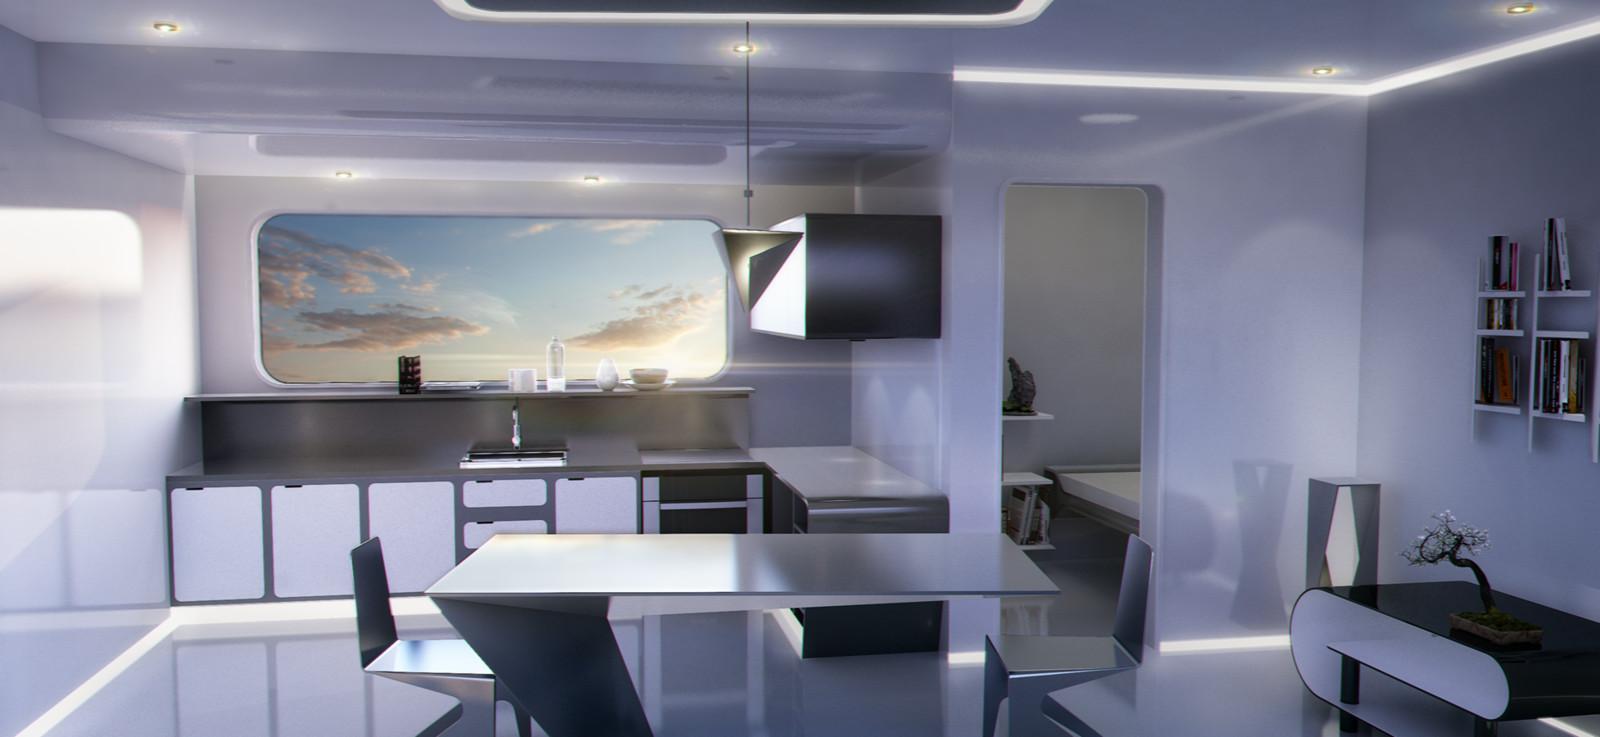 Futuristic/Sci fi minimalist apartment interior